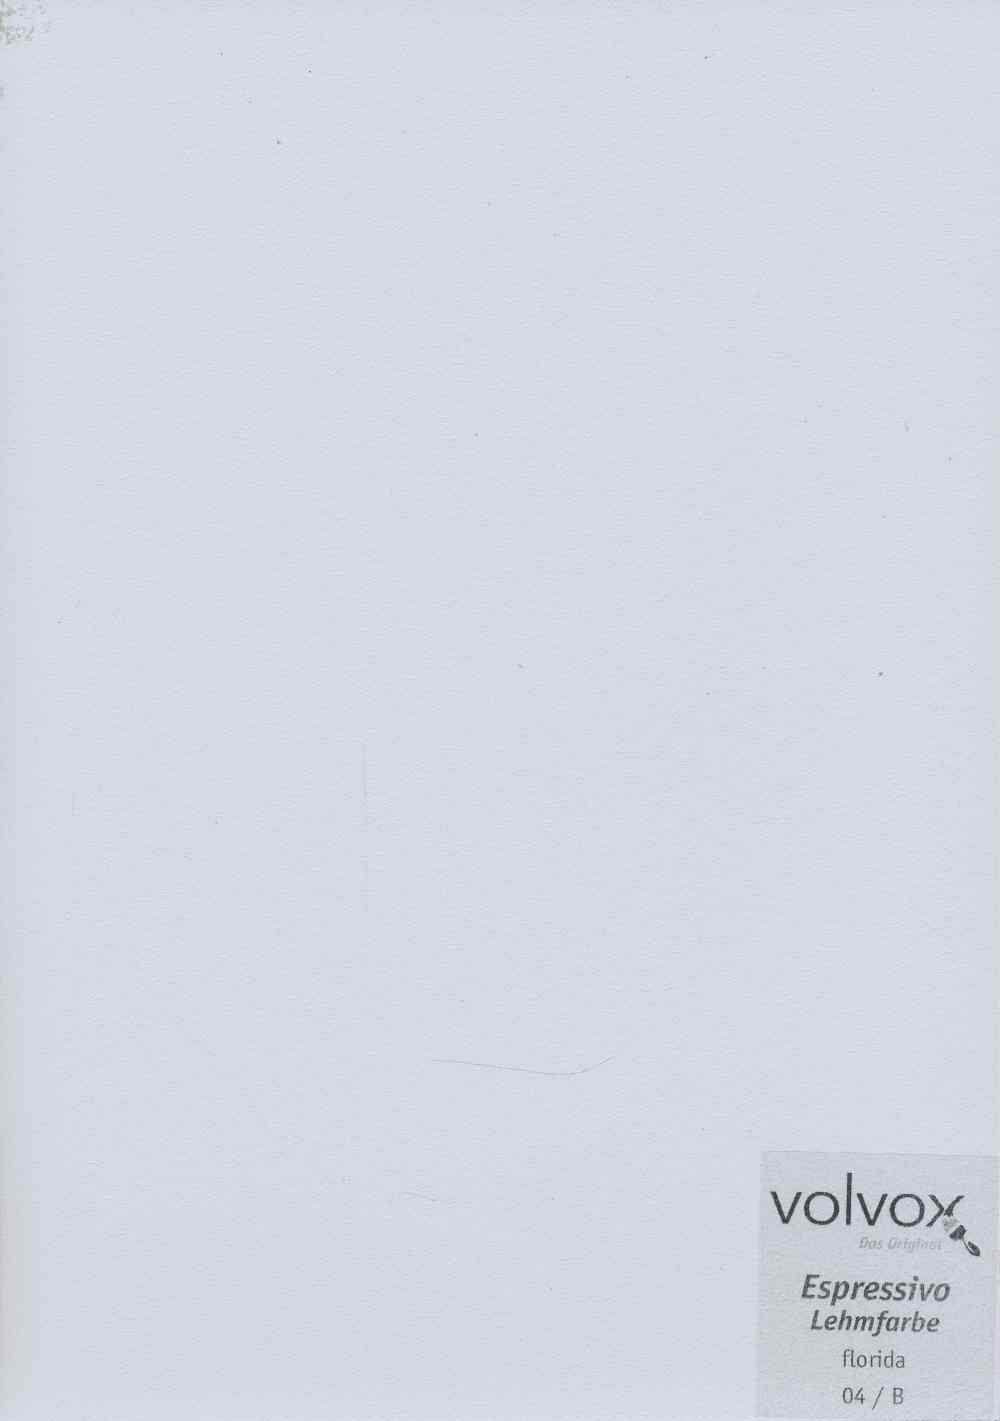 Volvox Espressivo Lehmfarbe 004 florida